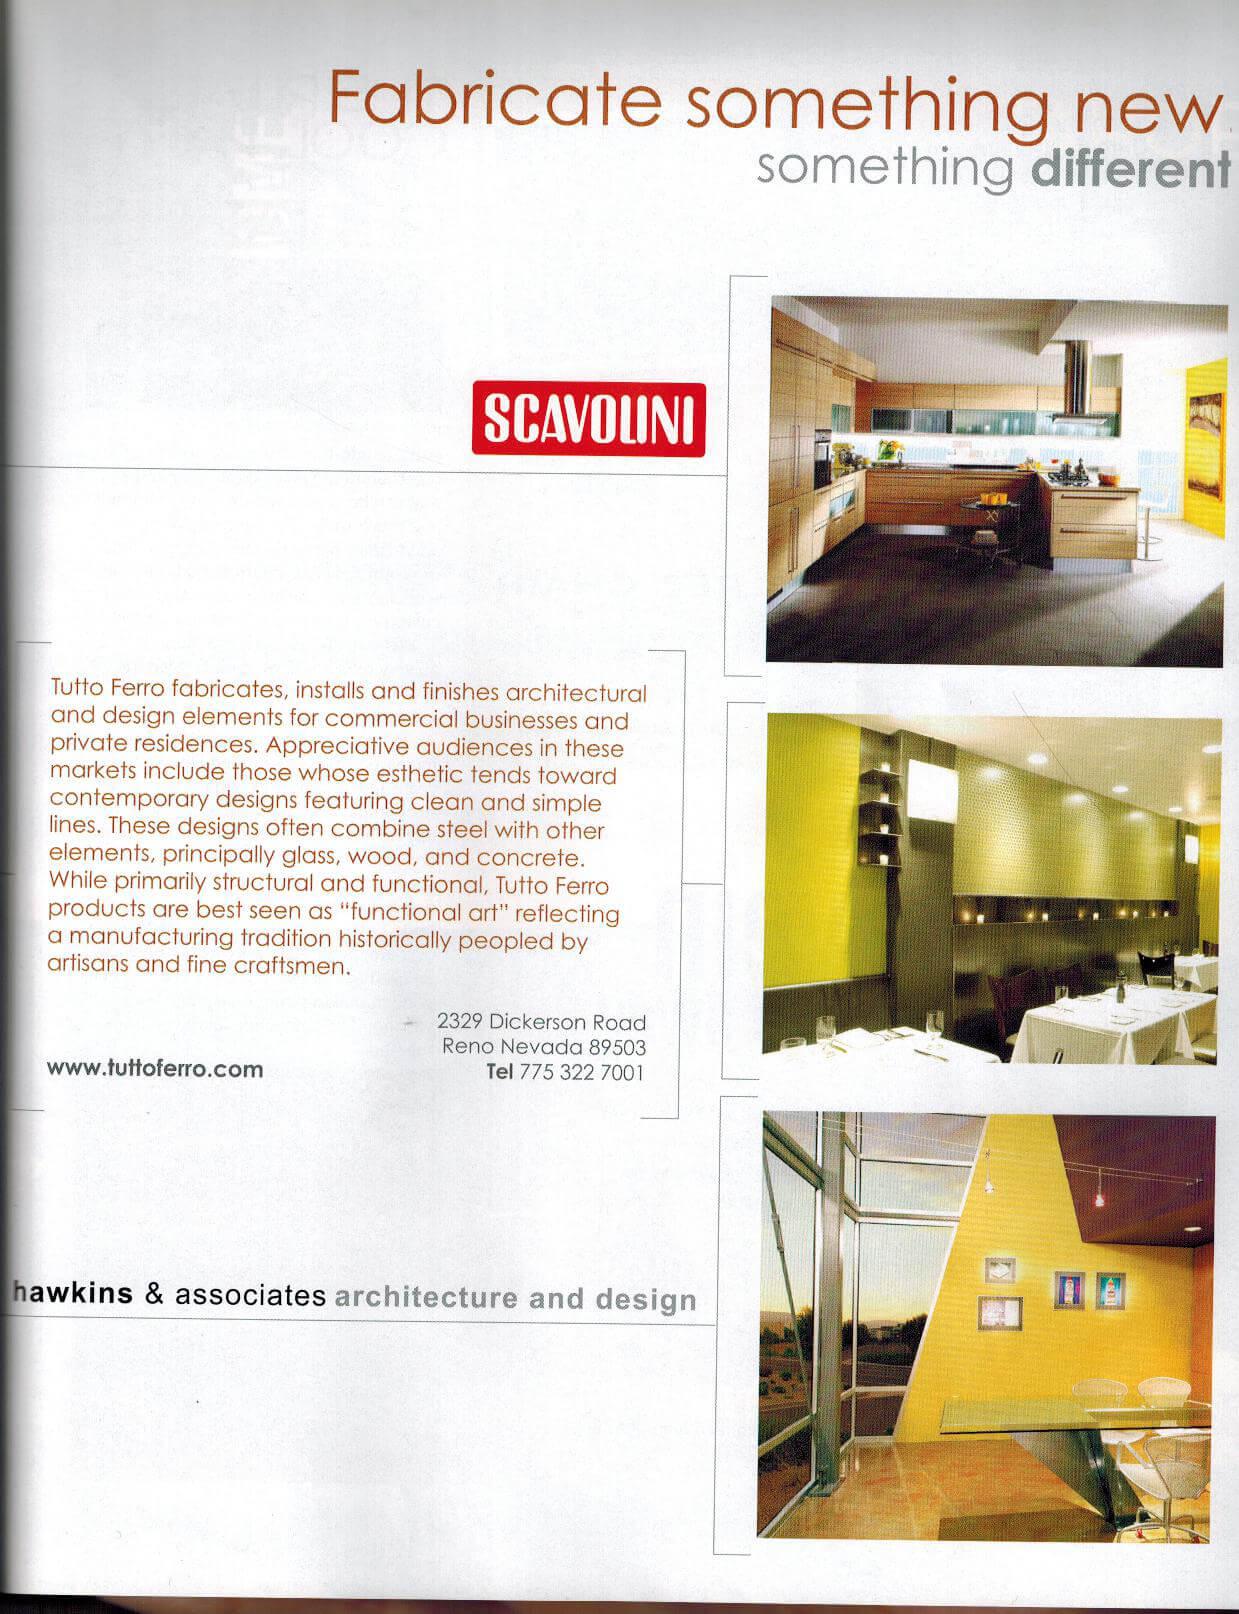 Tahoe Quarterly 2005 - Stremmel Gallery0004